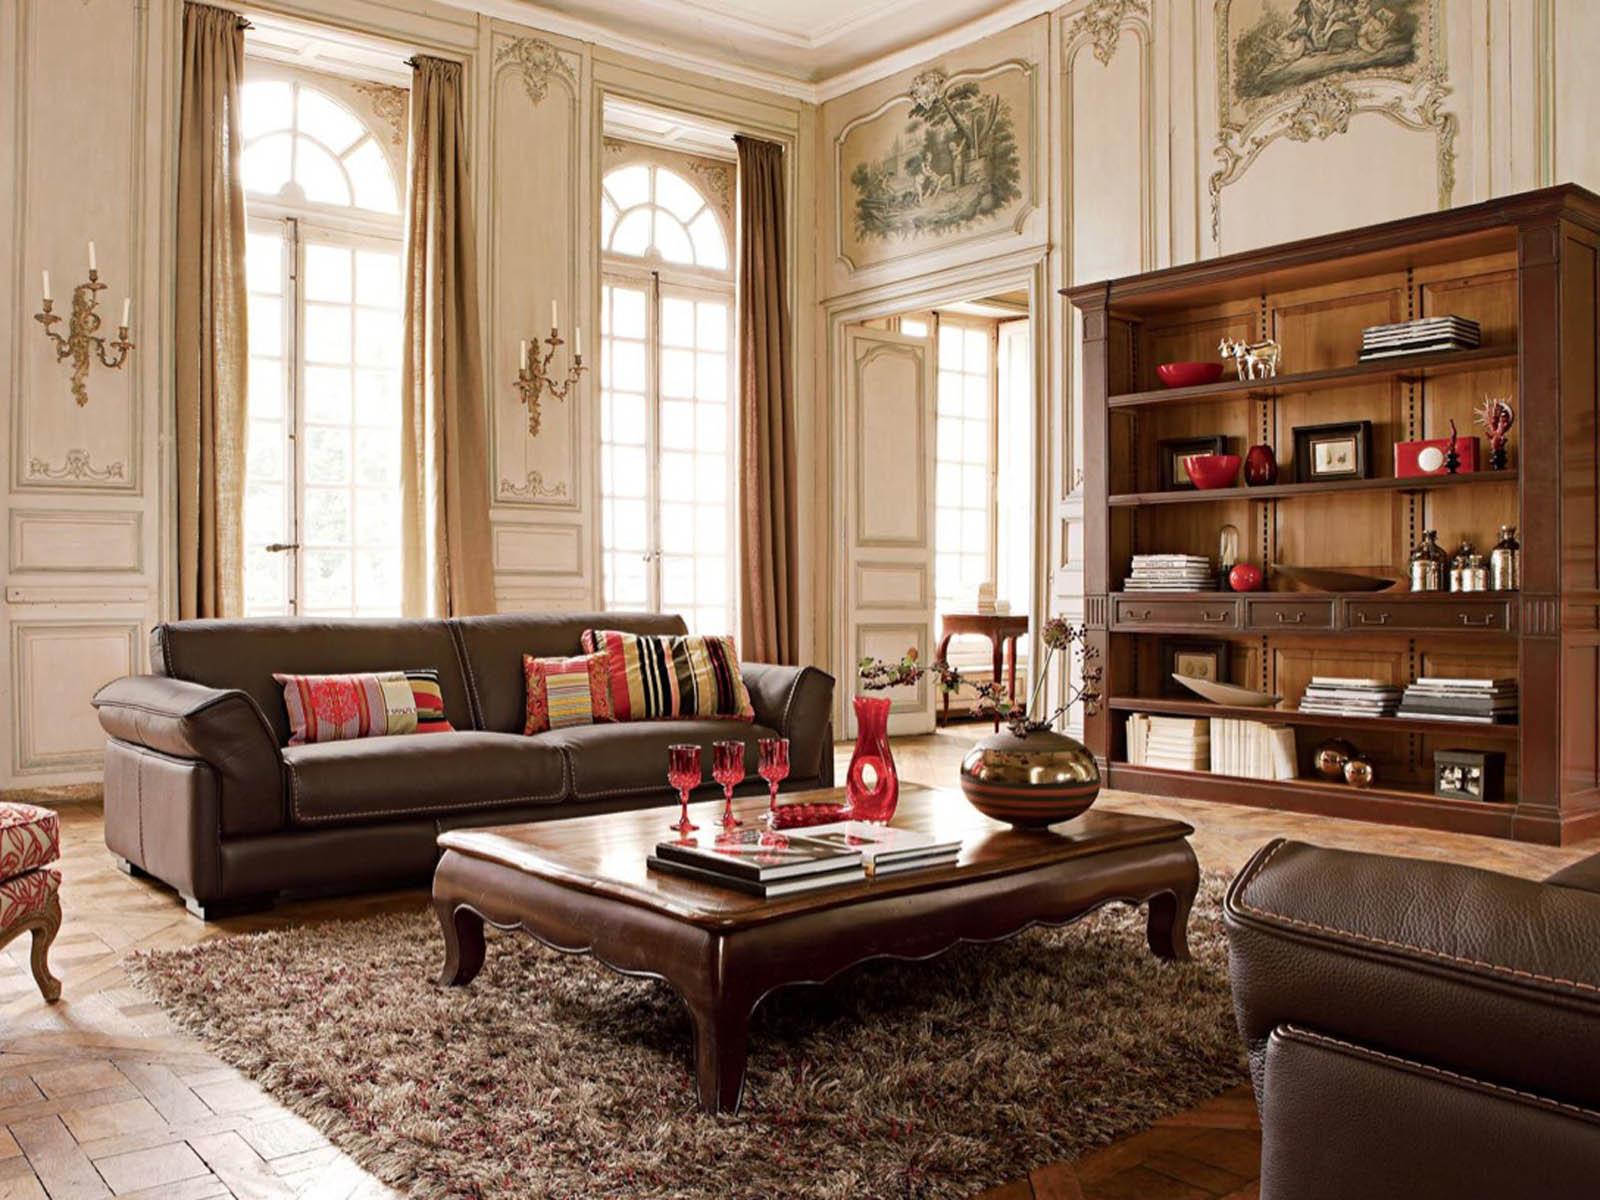 http://1.bp.blogspot.com/-Lh3JyySXieY/UKpB3mttDLI/AAAAAAAANvg/UDCQlEtFcGE/s1600/Modern+Living+Room+Paos+10.jpg